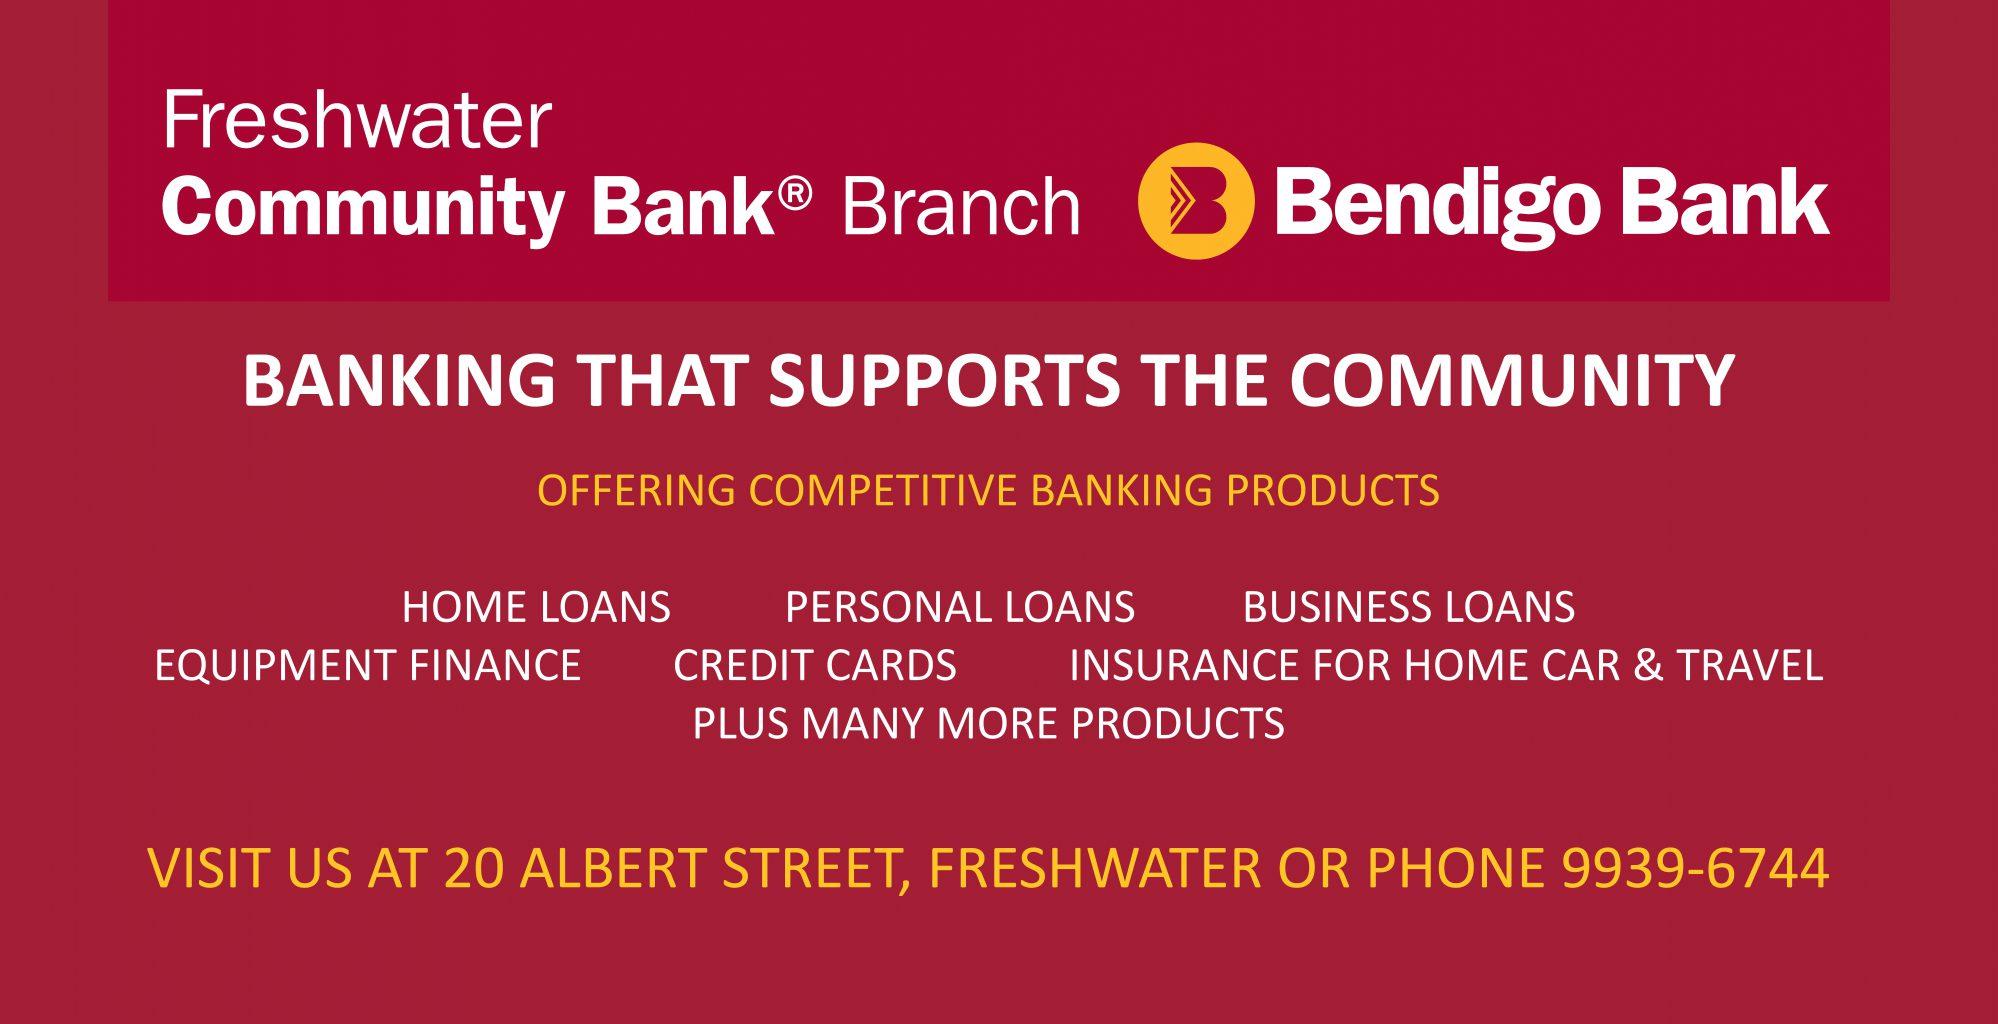 Freshwater Community Bank - Branch of Bendigo Bank